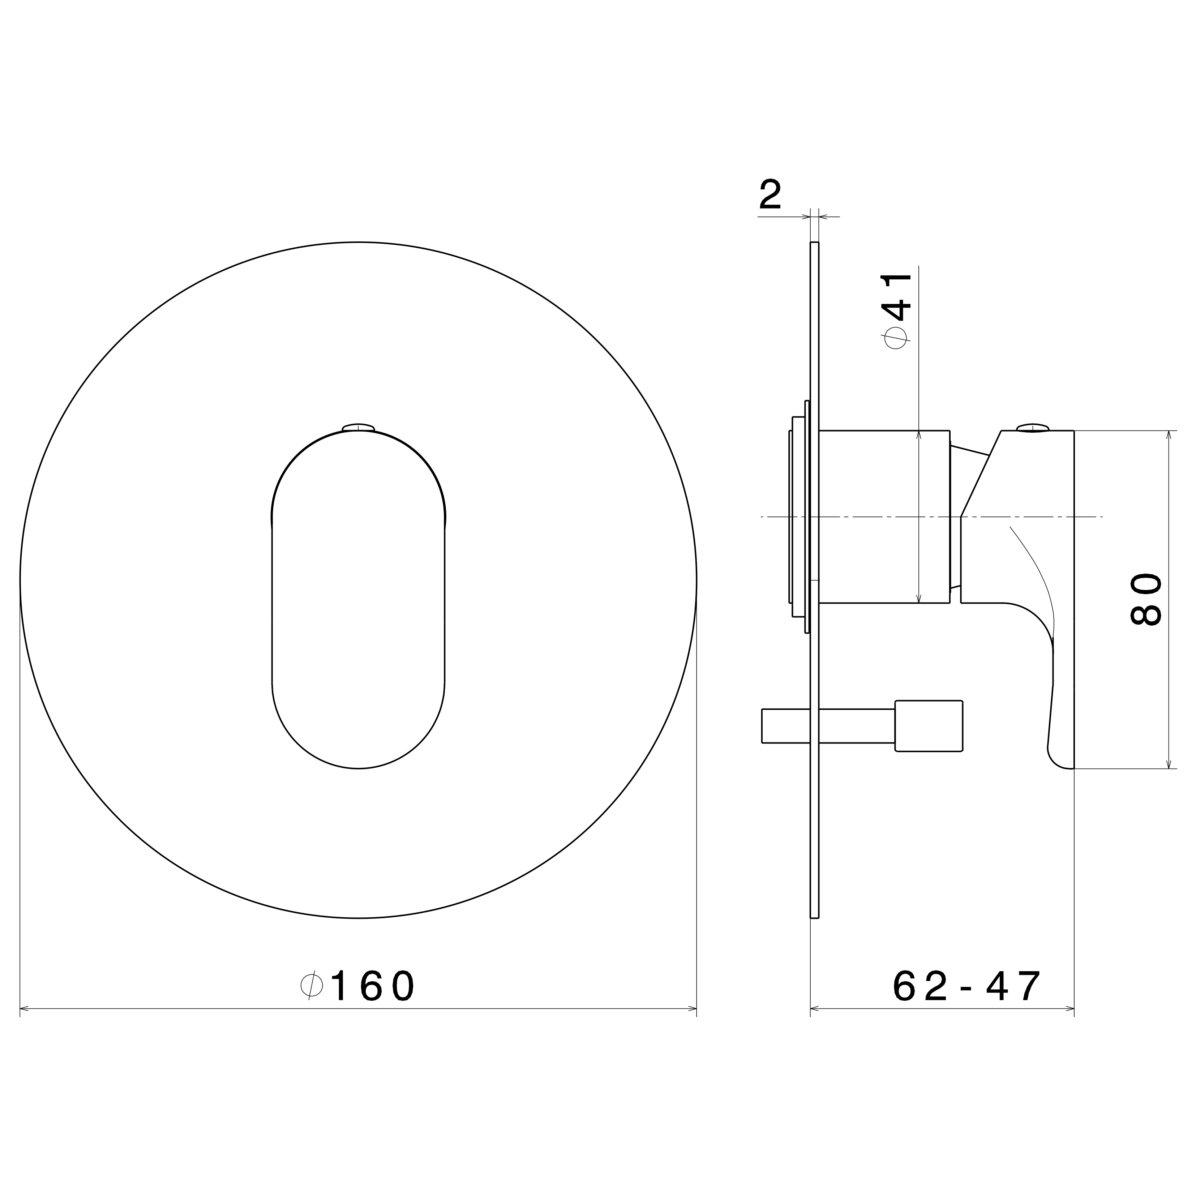 69470 Newform LINFA ii Diverter Mixer_Stiles_TechDrawing_Image